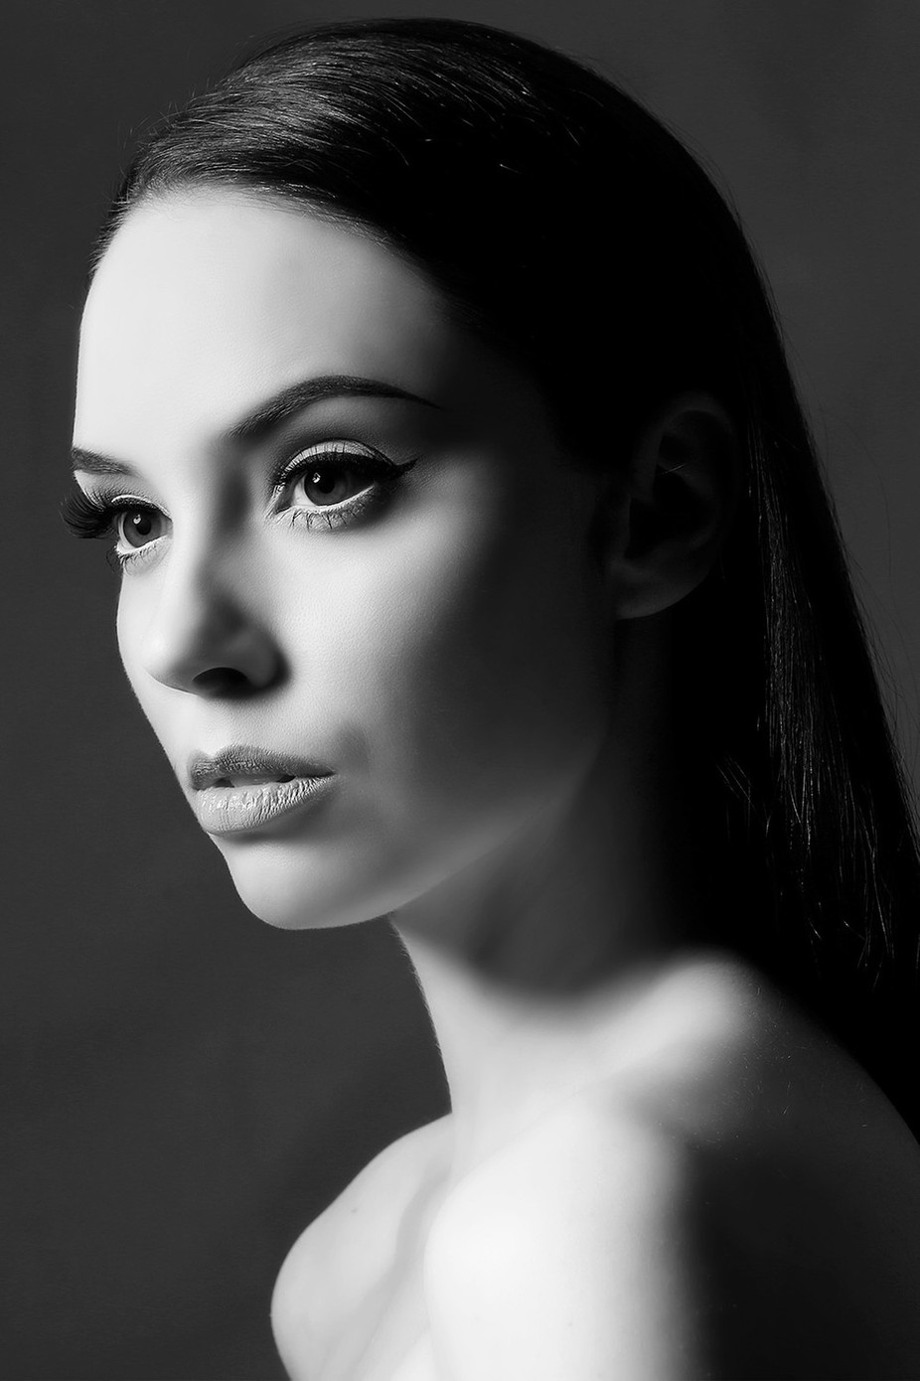 Nicola Jayne by burkittphoto - Black and White Portraits Photo Contest